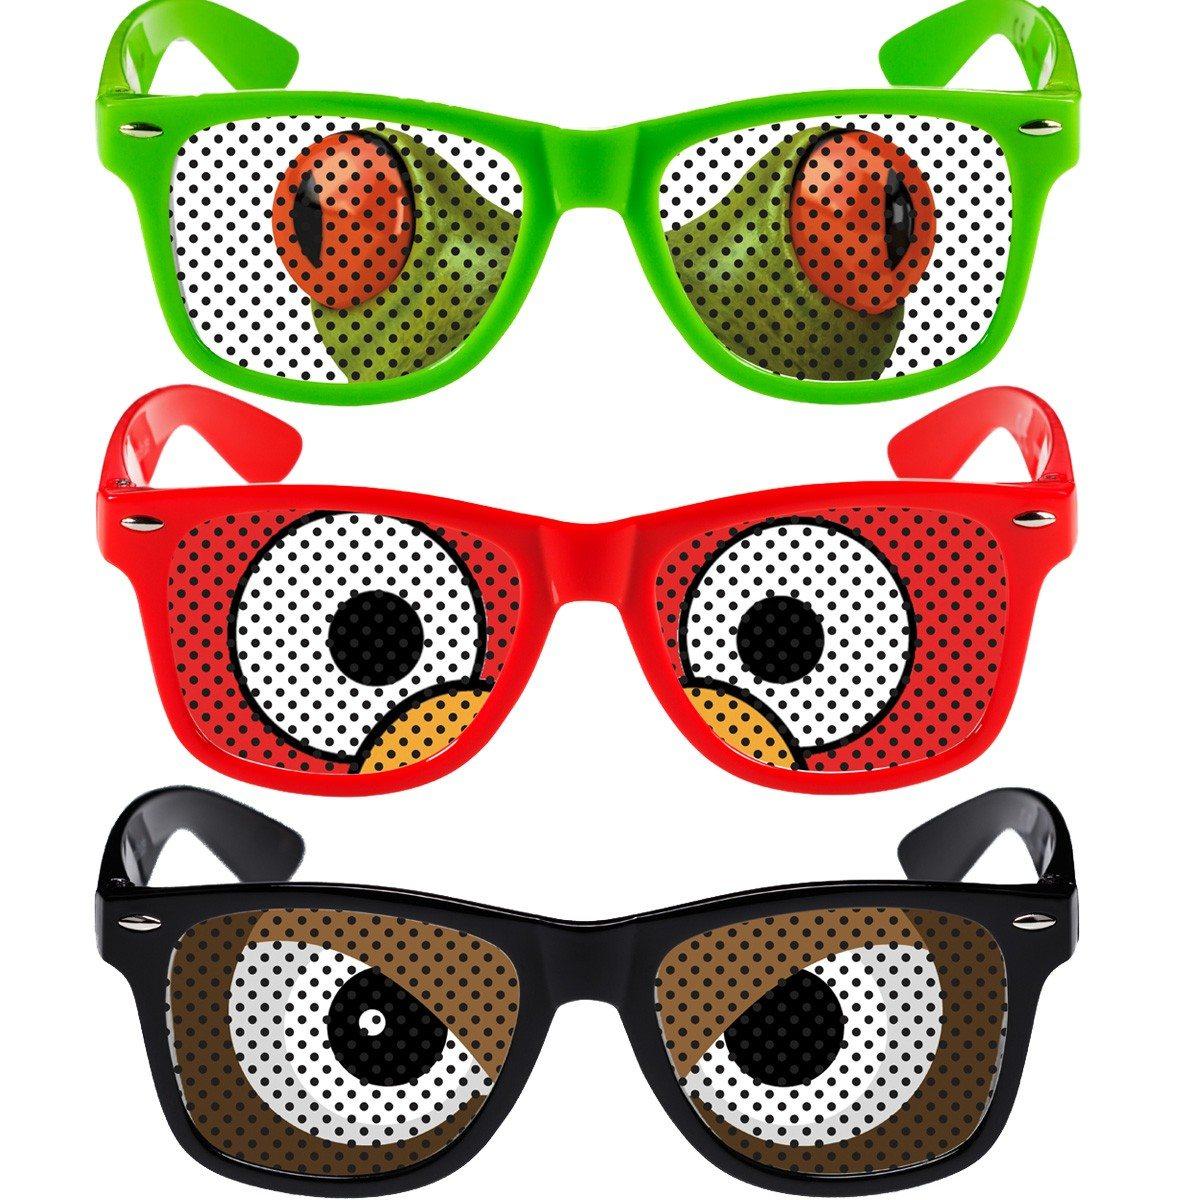 Witzige Brillen - Augen